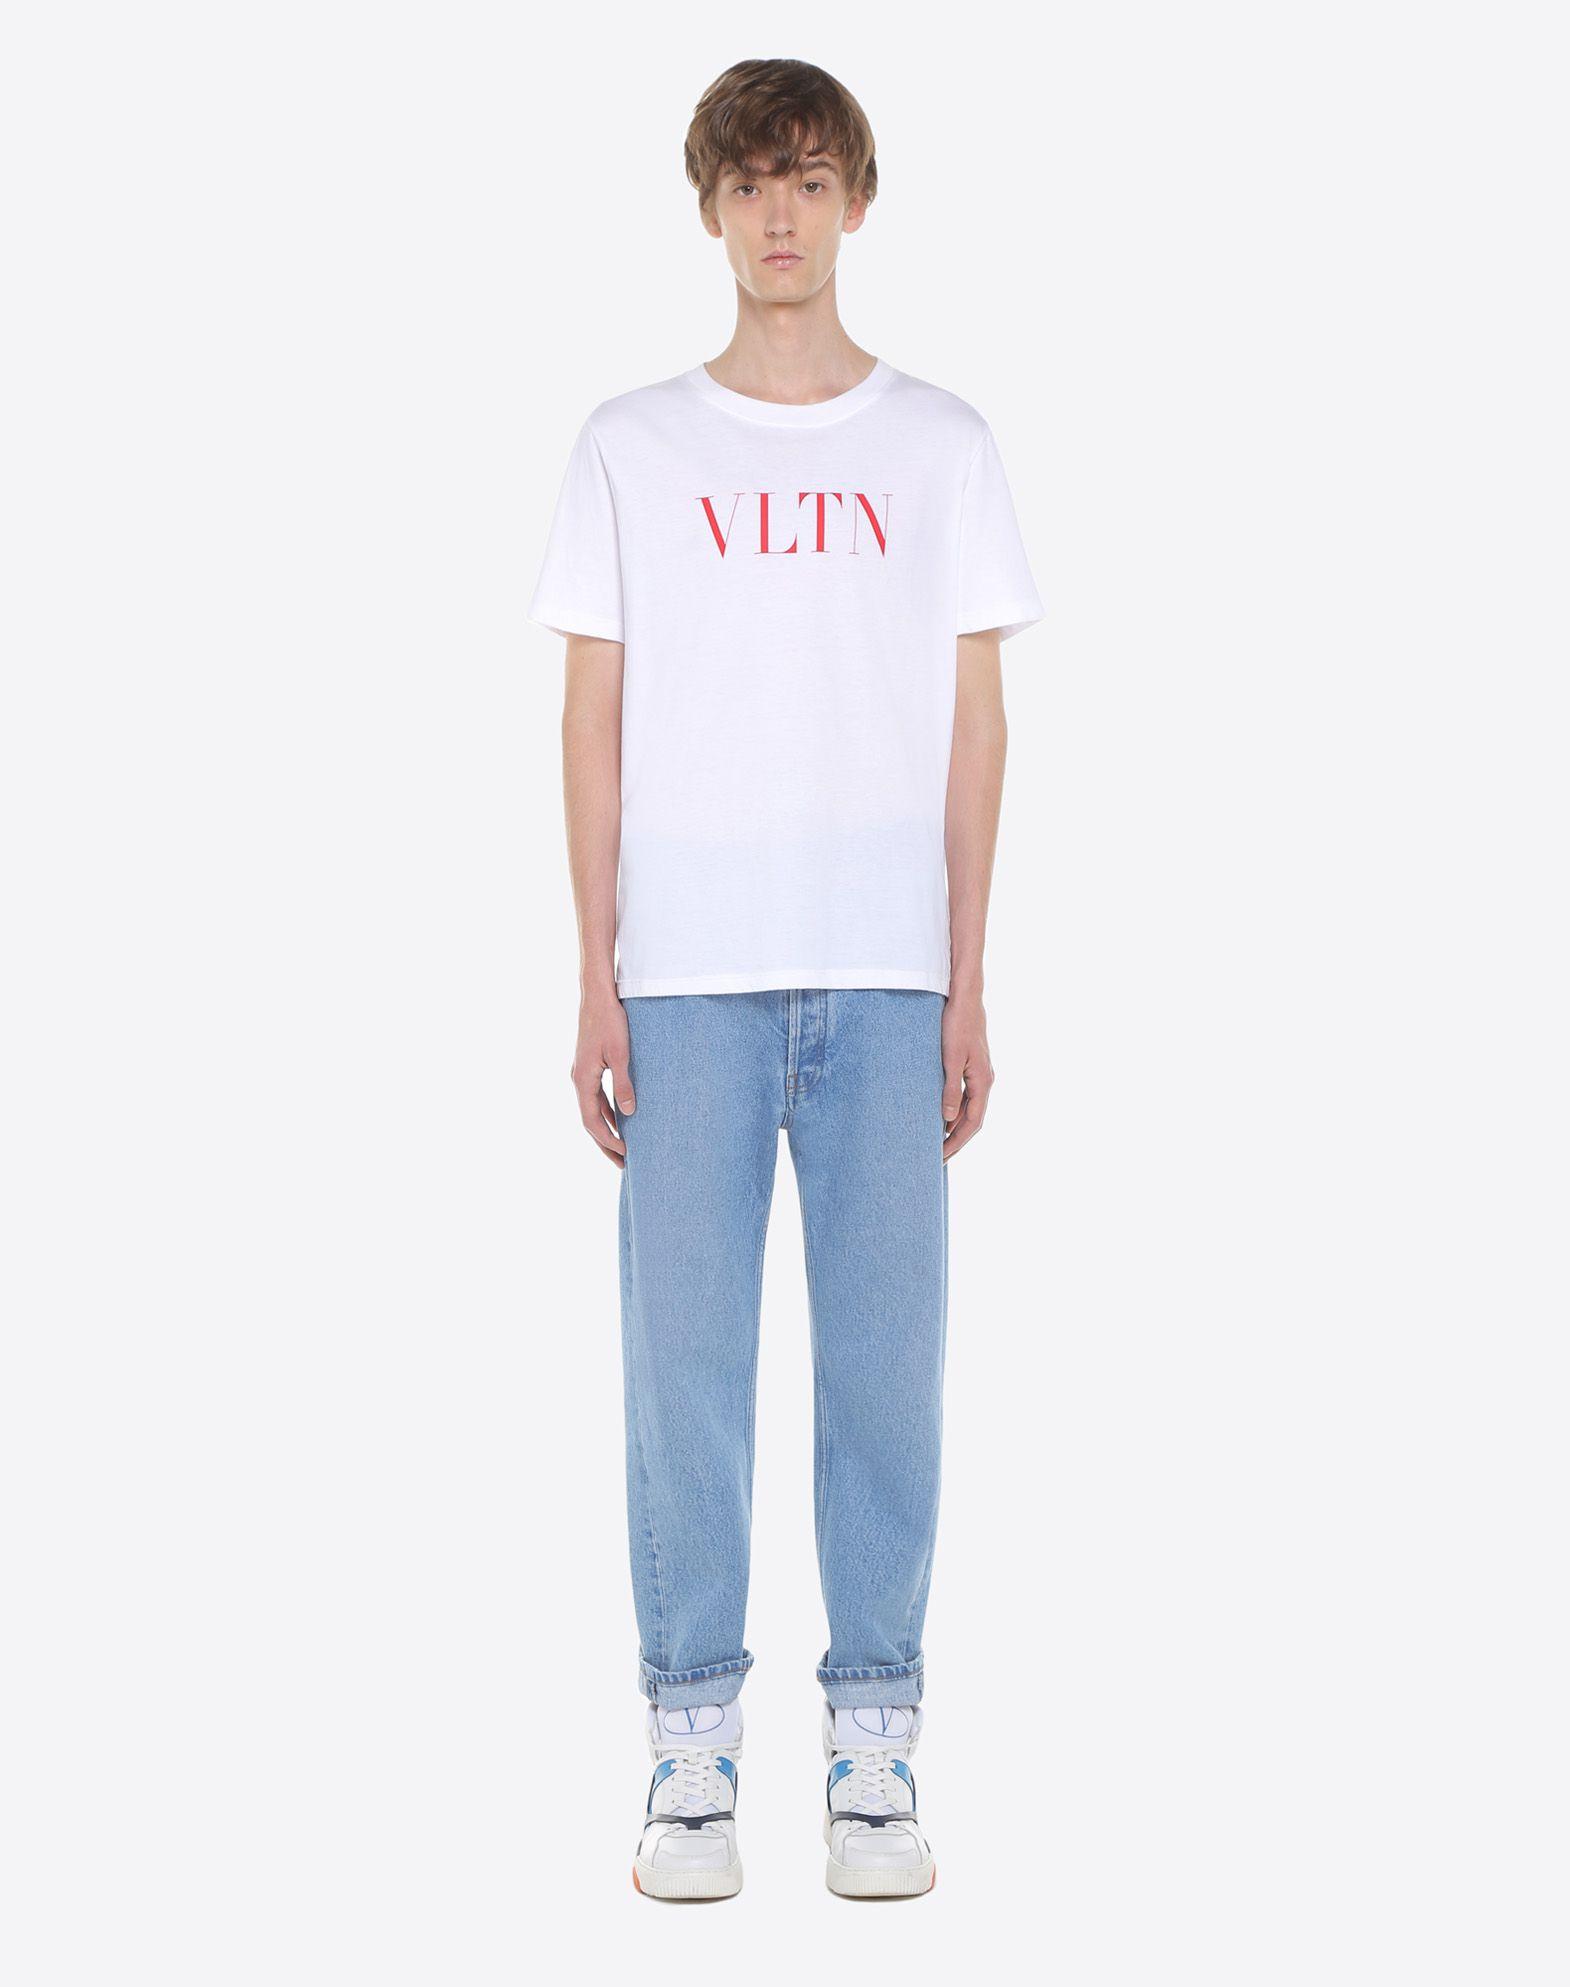 VALENTINO VLTN T-shirt T-shirt U r